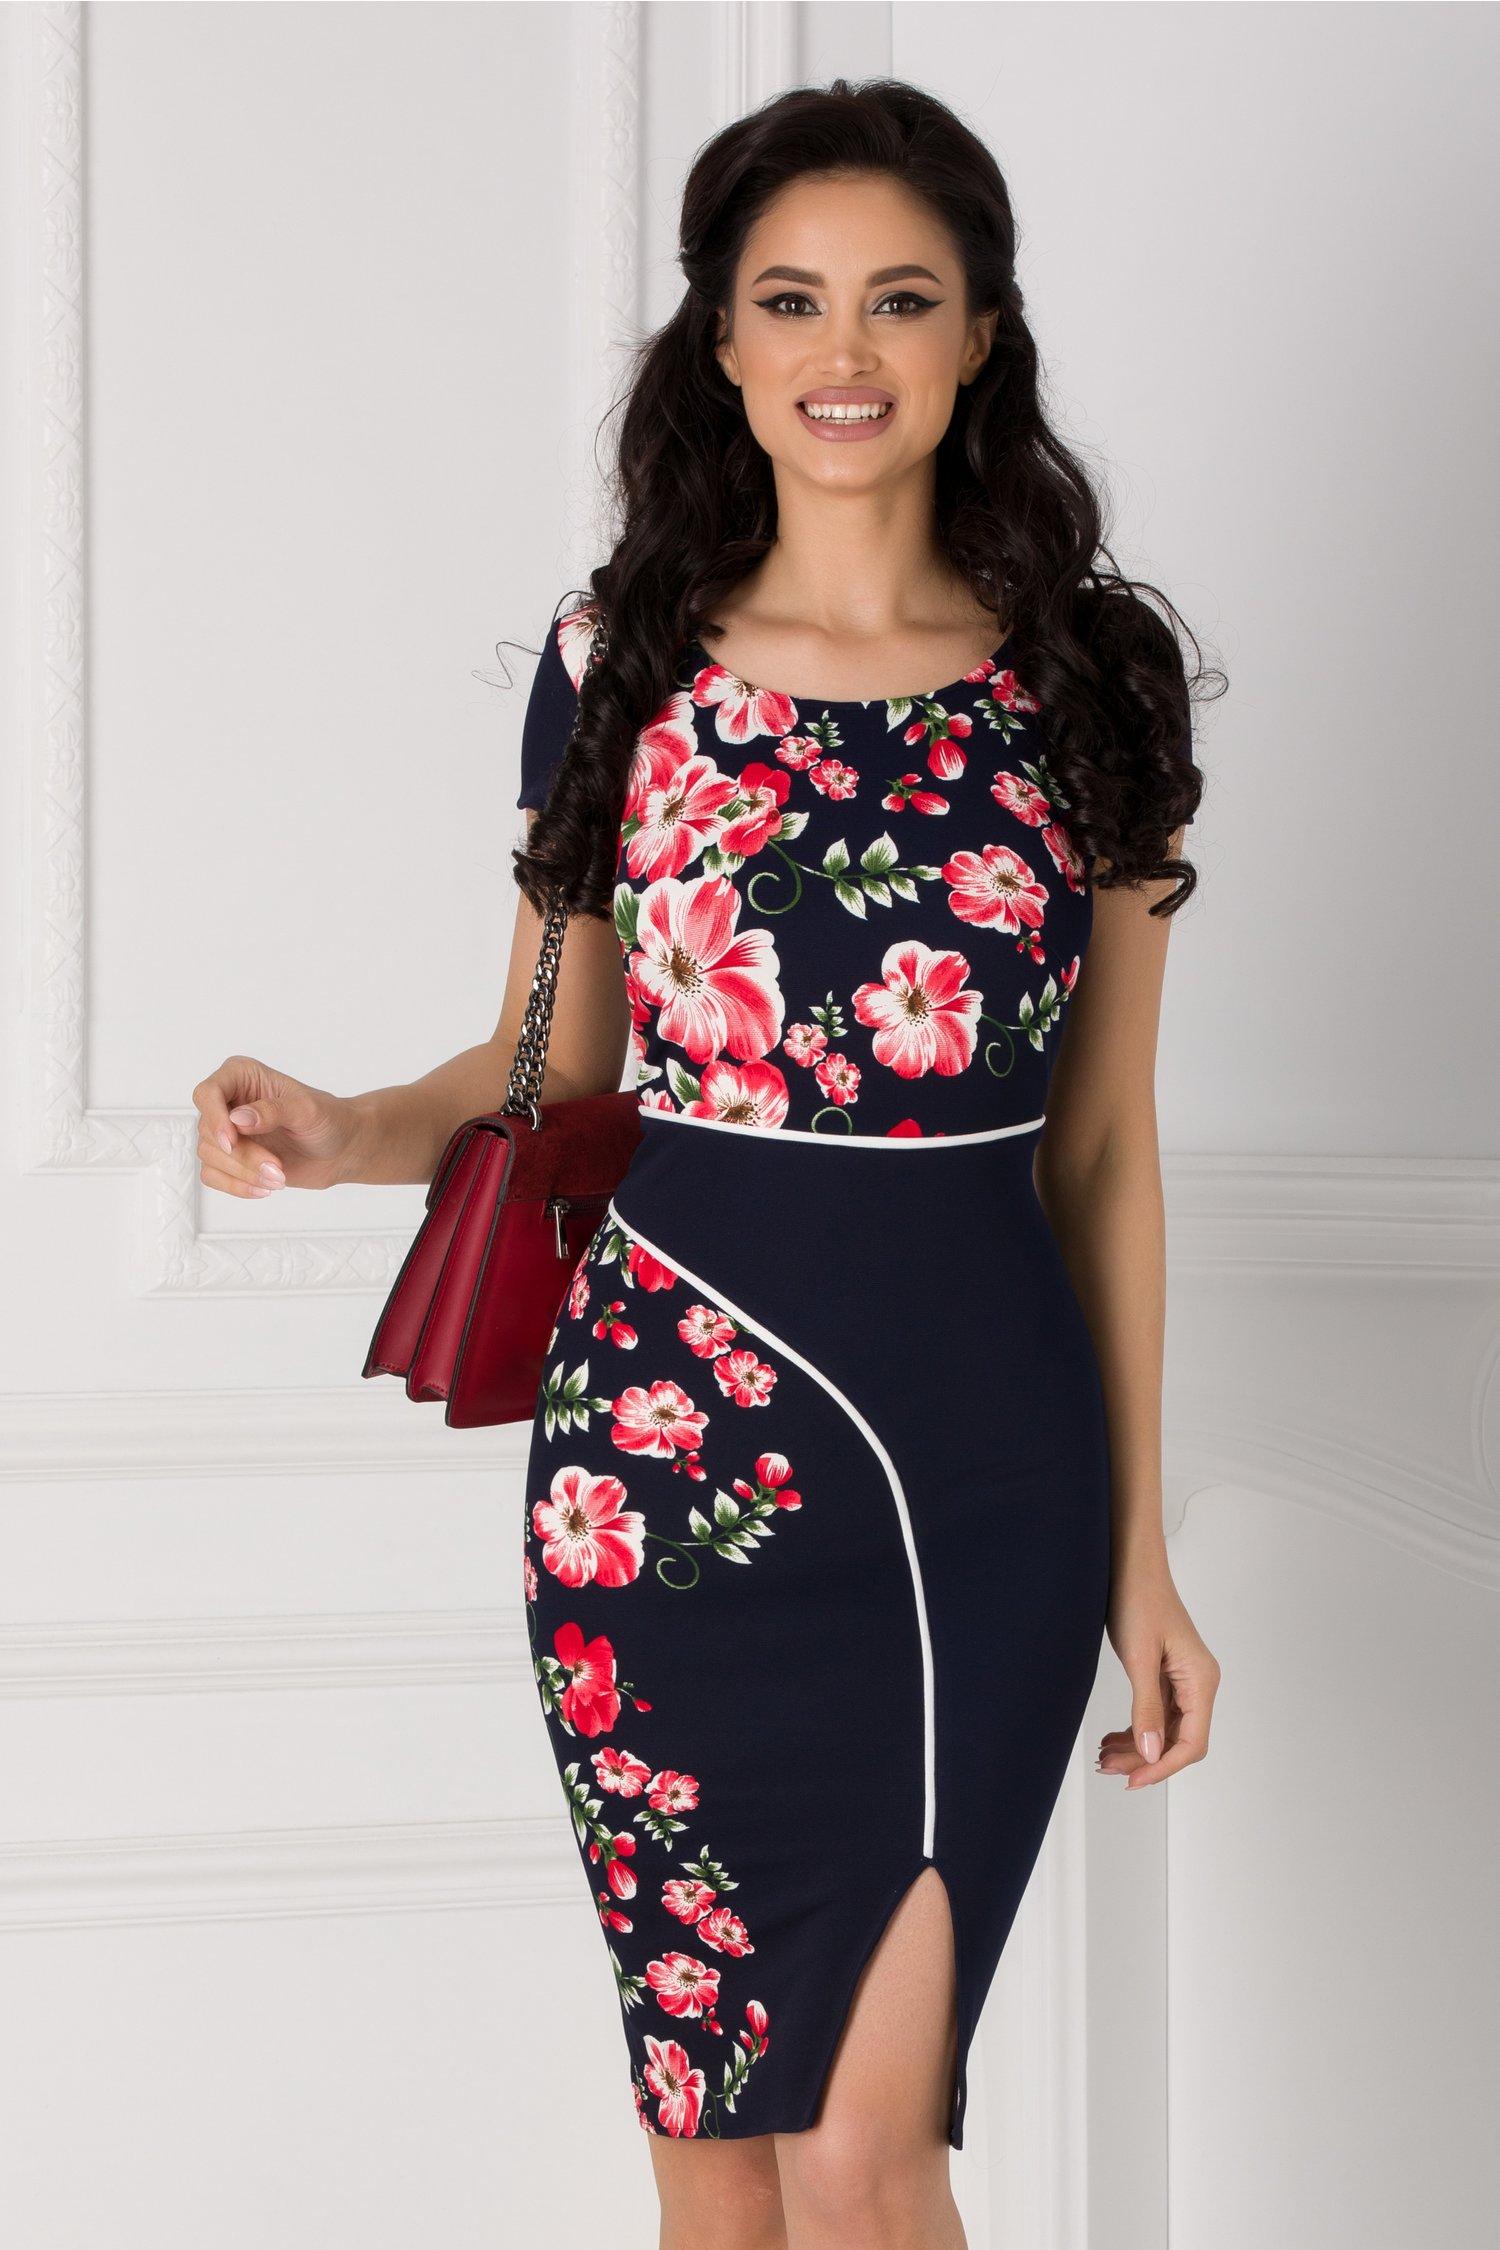 Rochie Carmen bleumarin cu imprimeu floral roz si dunga alba